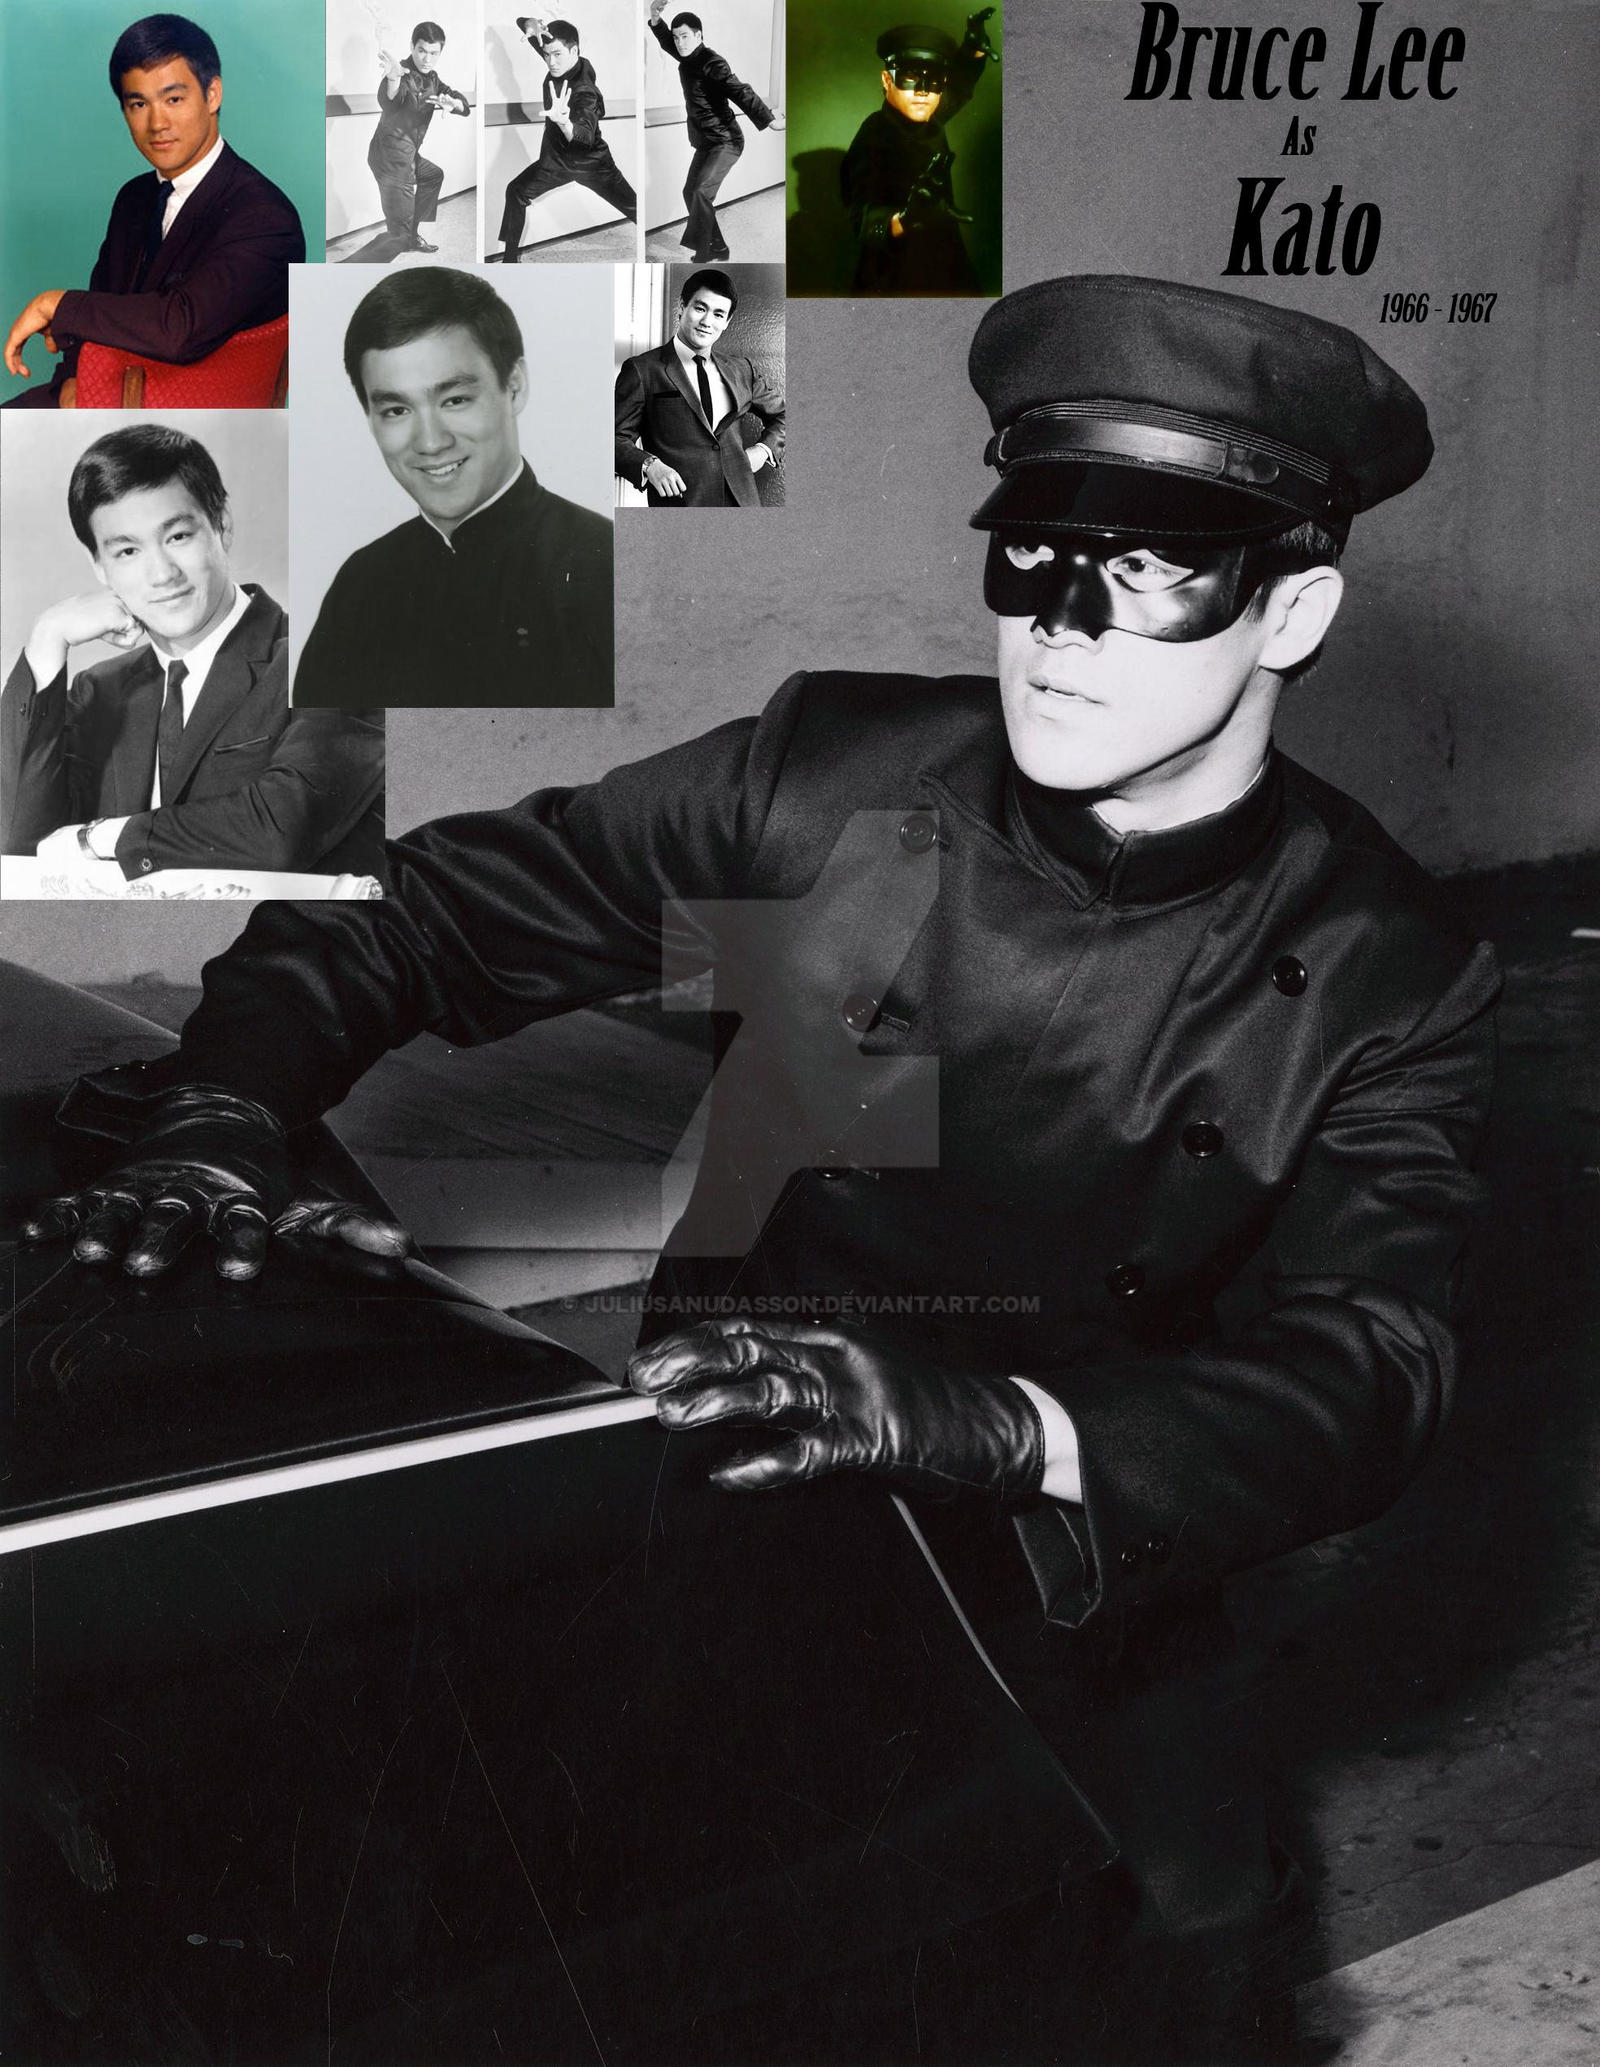 Bruce Lee as Kato 1966...